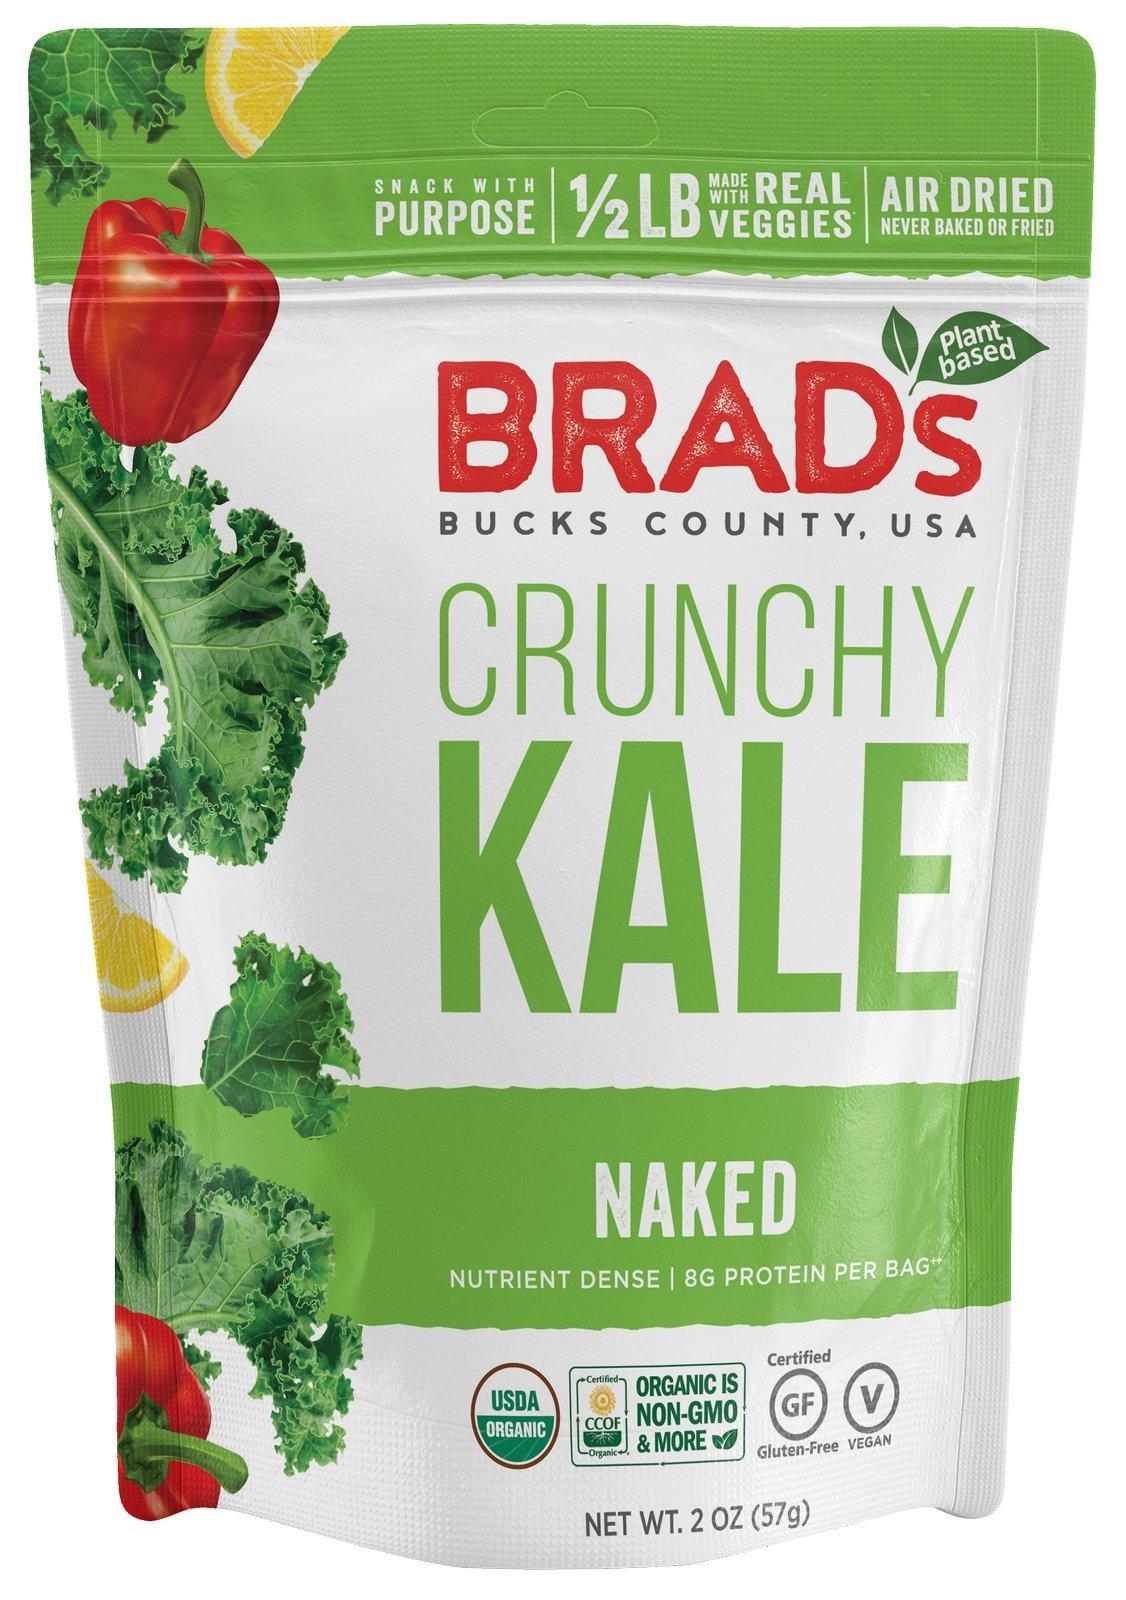 Brad's Plant Based Organic Crunchy Kale, Naked, 3 Count